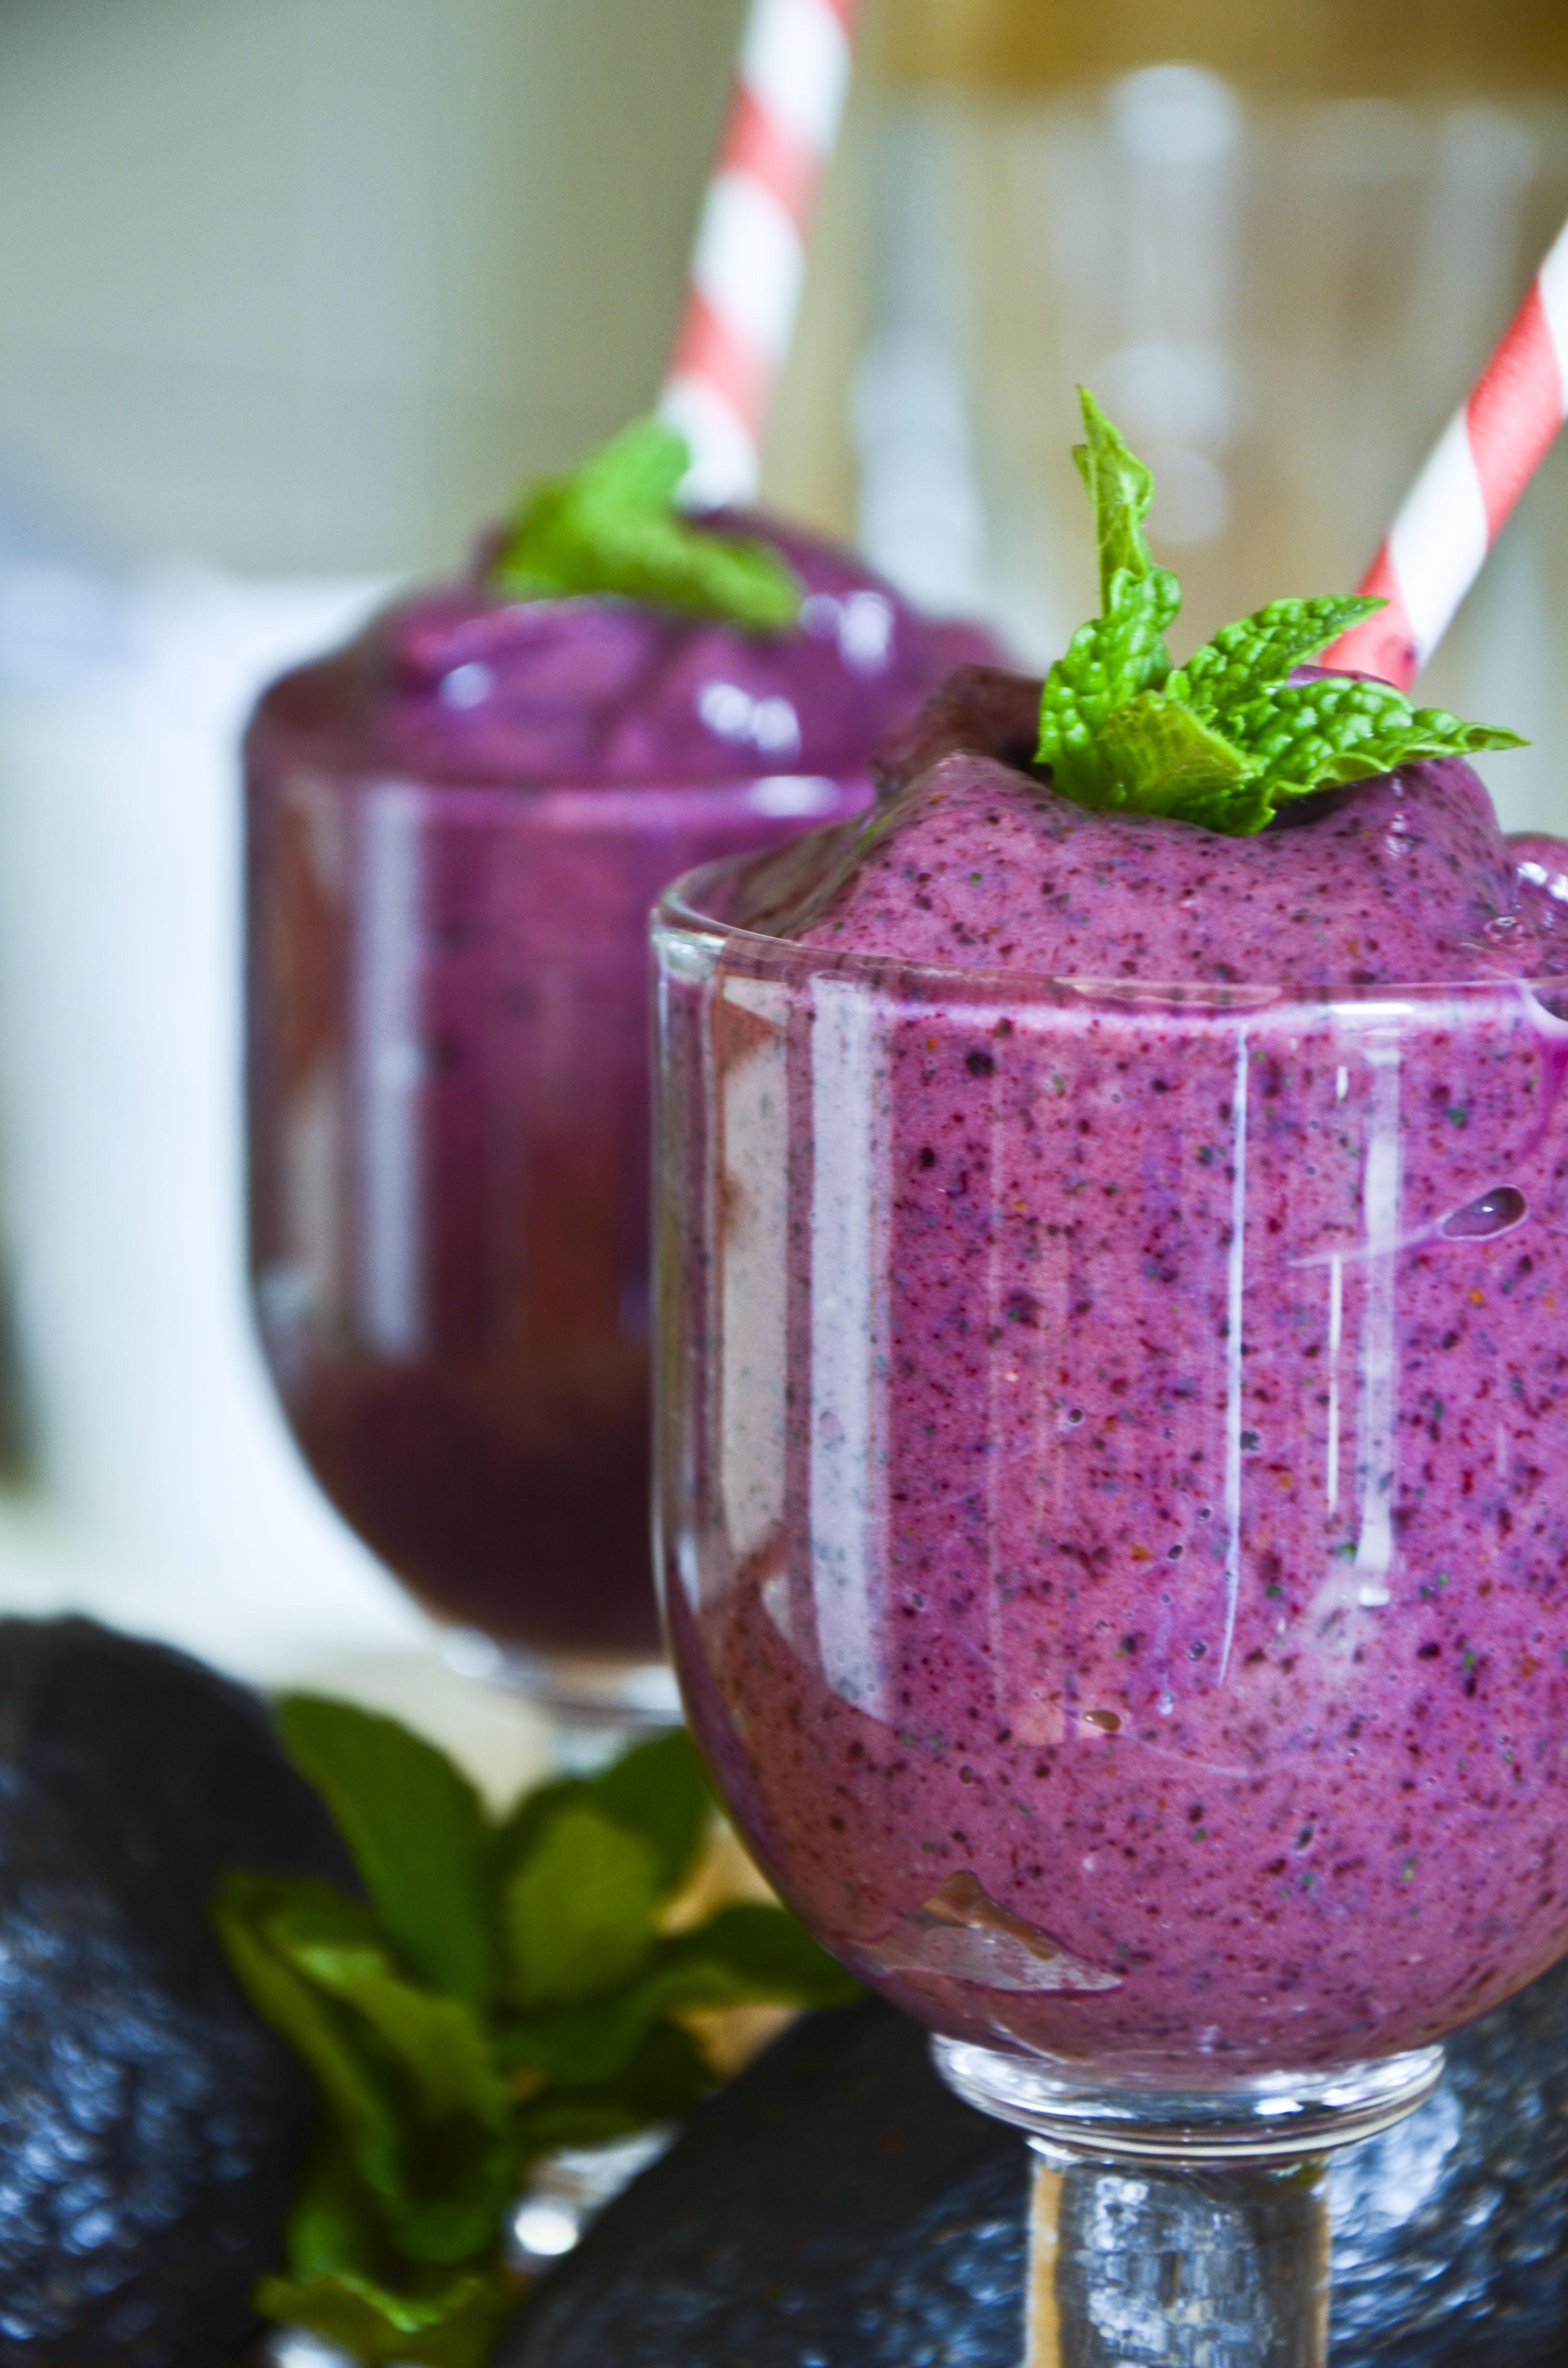 Blueberry Avocado Detox Smoothie –